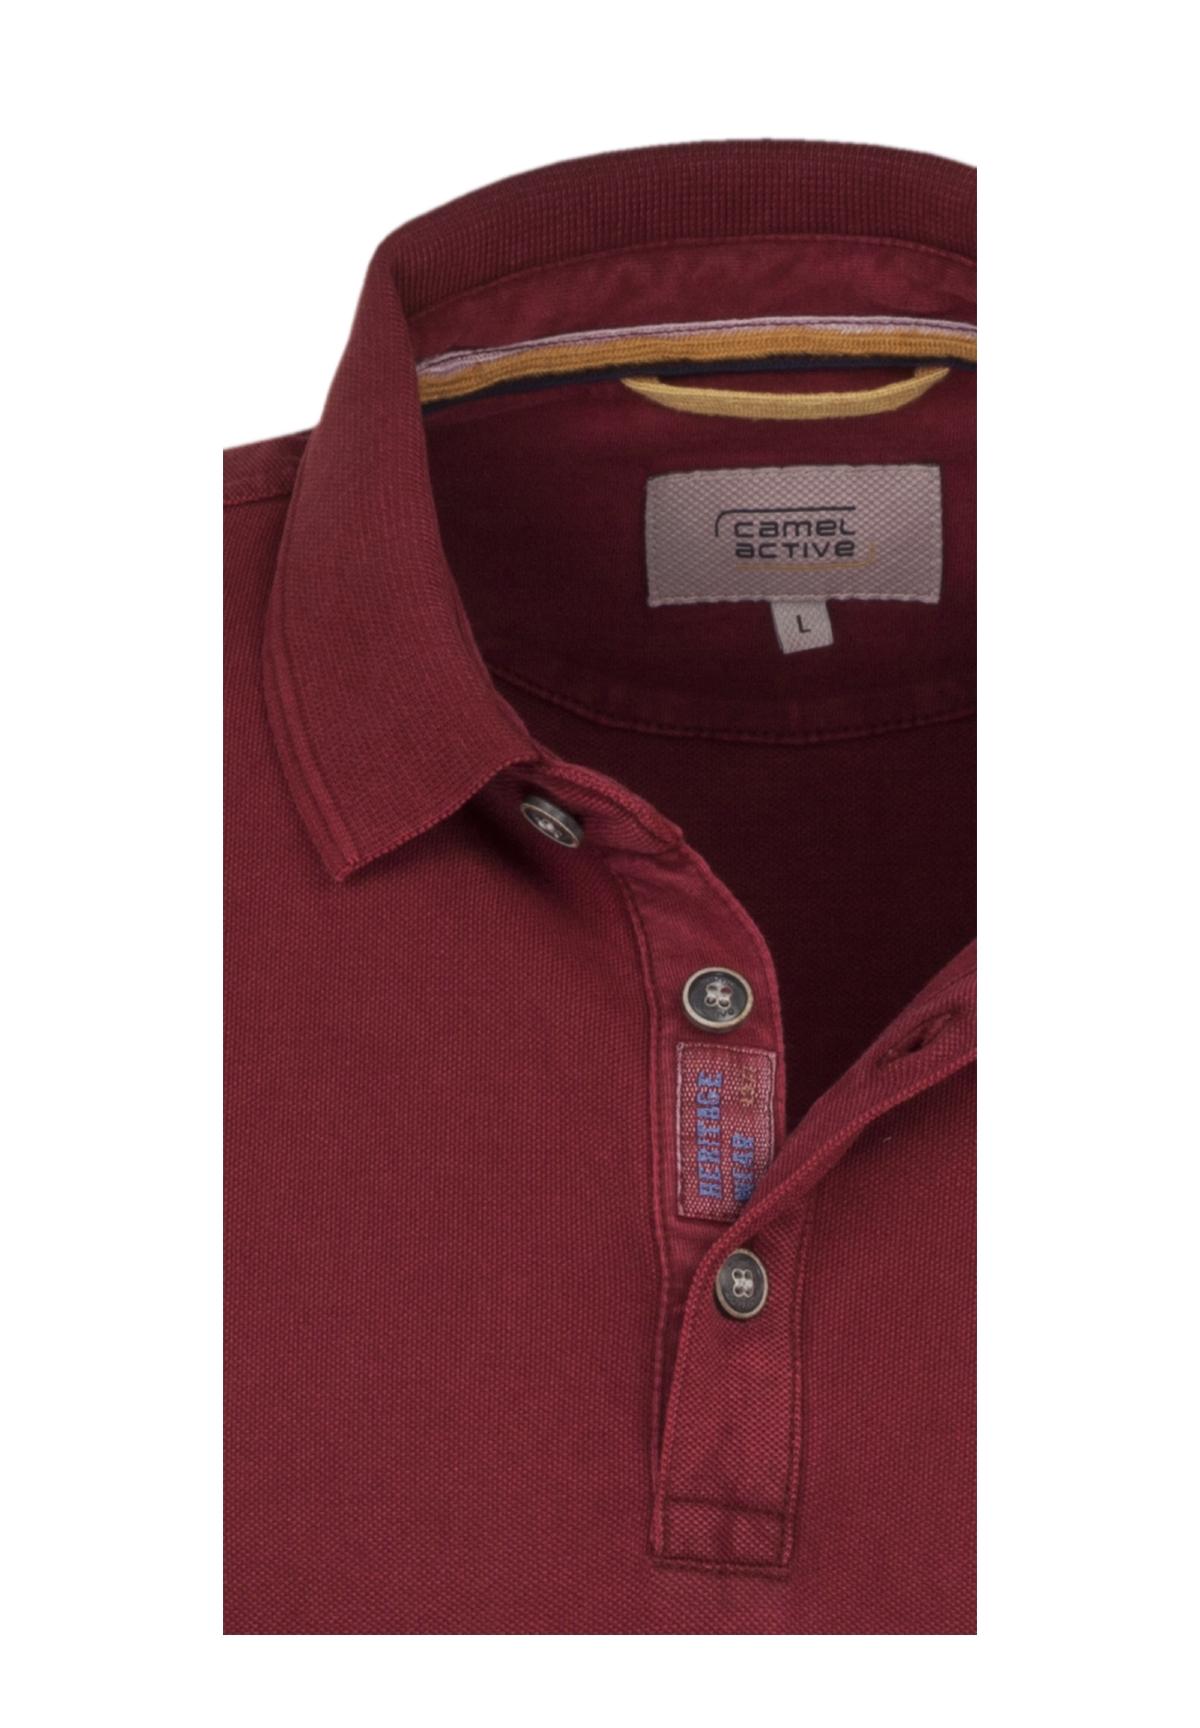 Camel-Active-Herren-Shirt-Poloshirt-Pique-Regular-Fit-NEU Indexbild 54